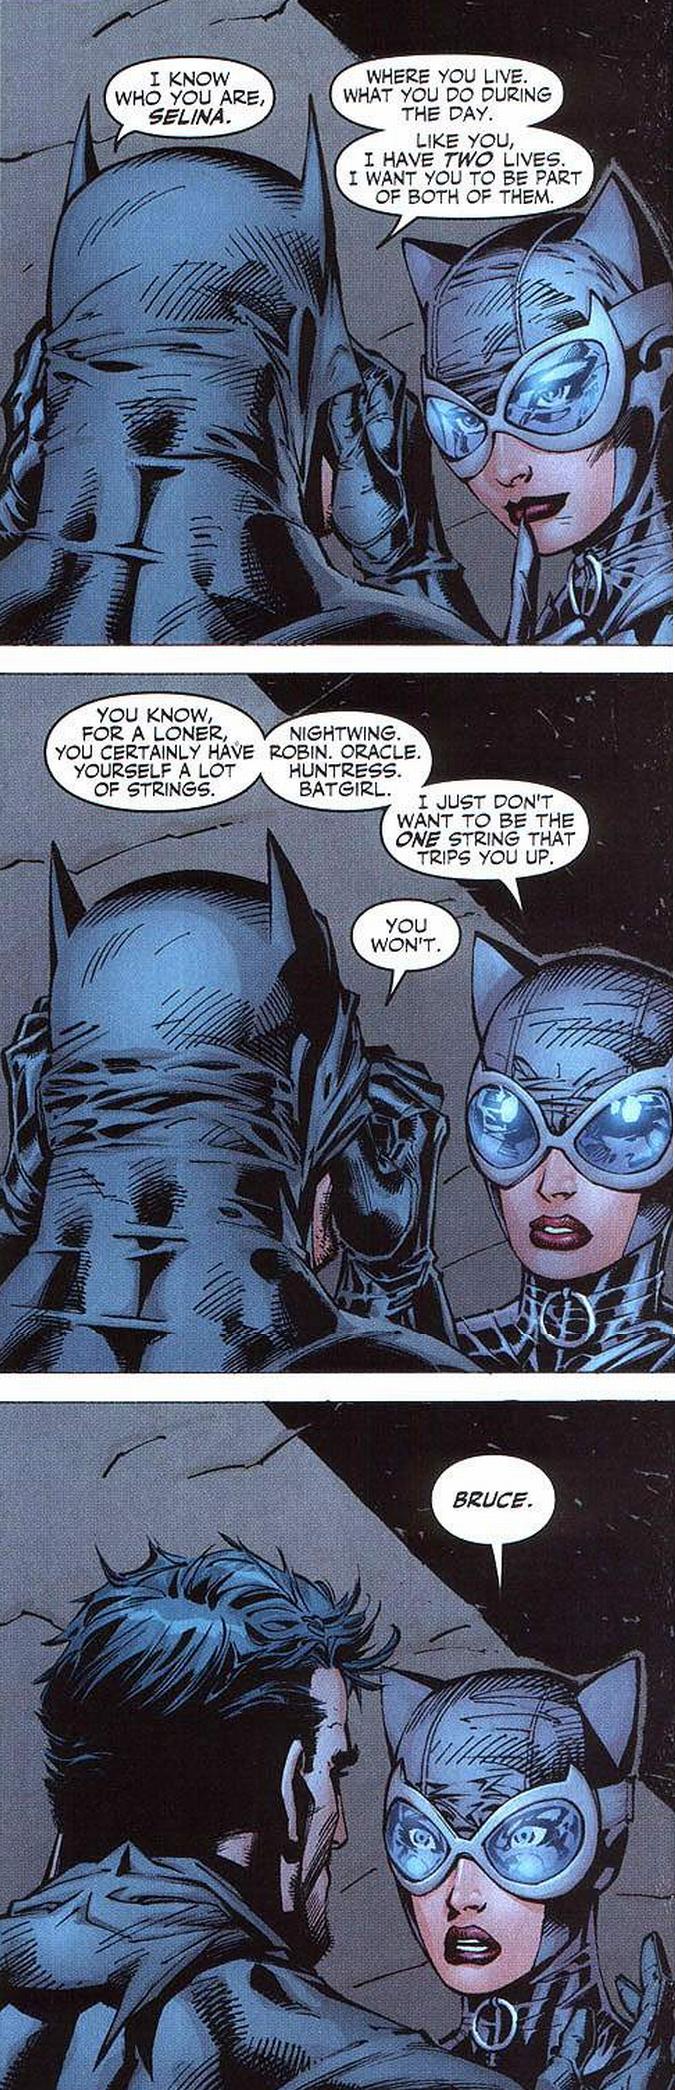 [TEMPORADA 1] CLASH OF SUPERHEROES - Parte 1 - - Página 20 Batcat19